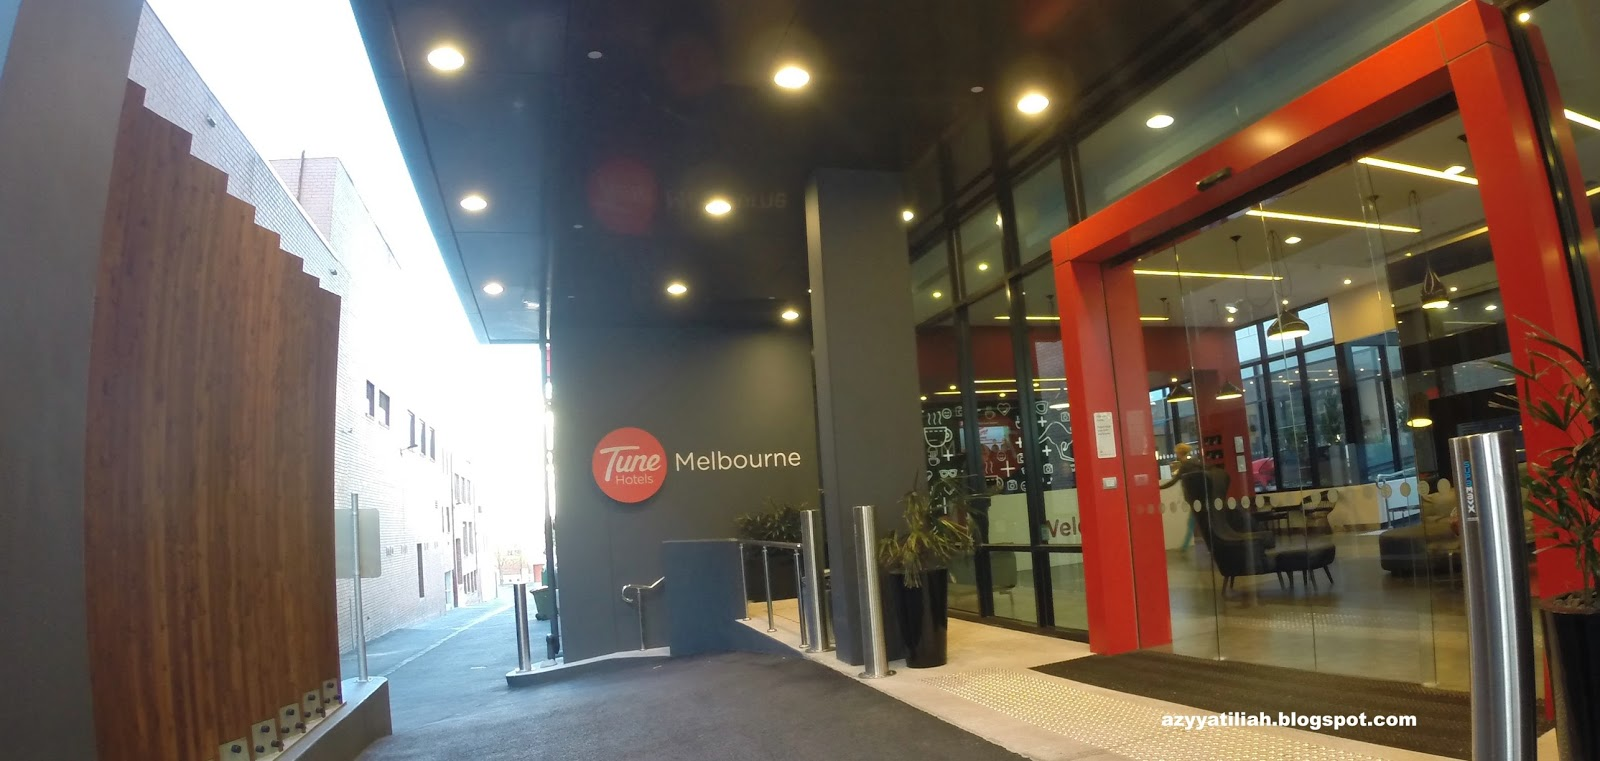 Tune hotel melbourne deals